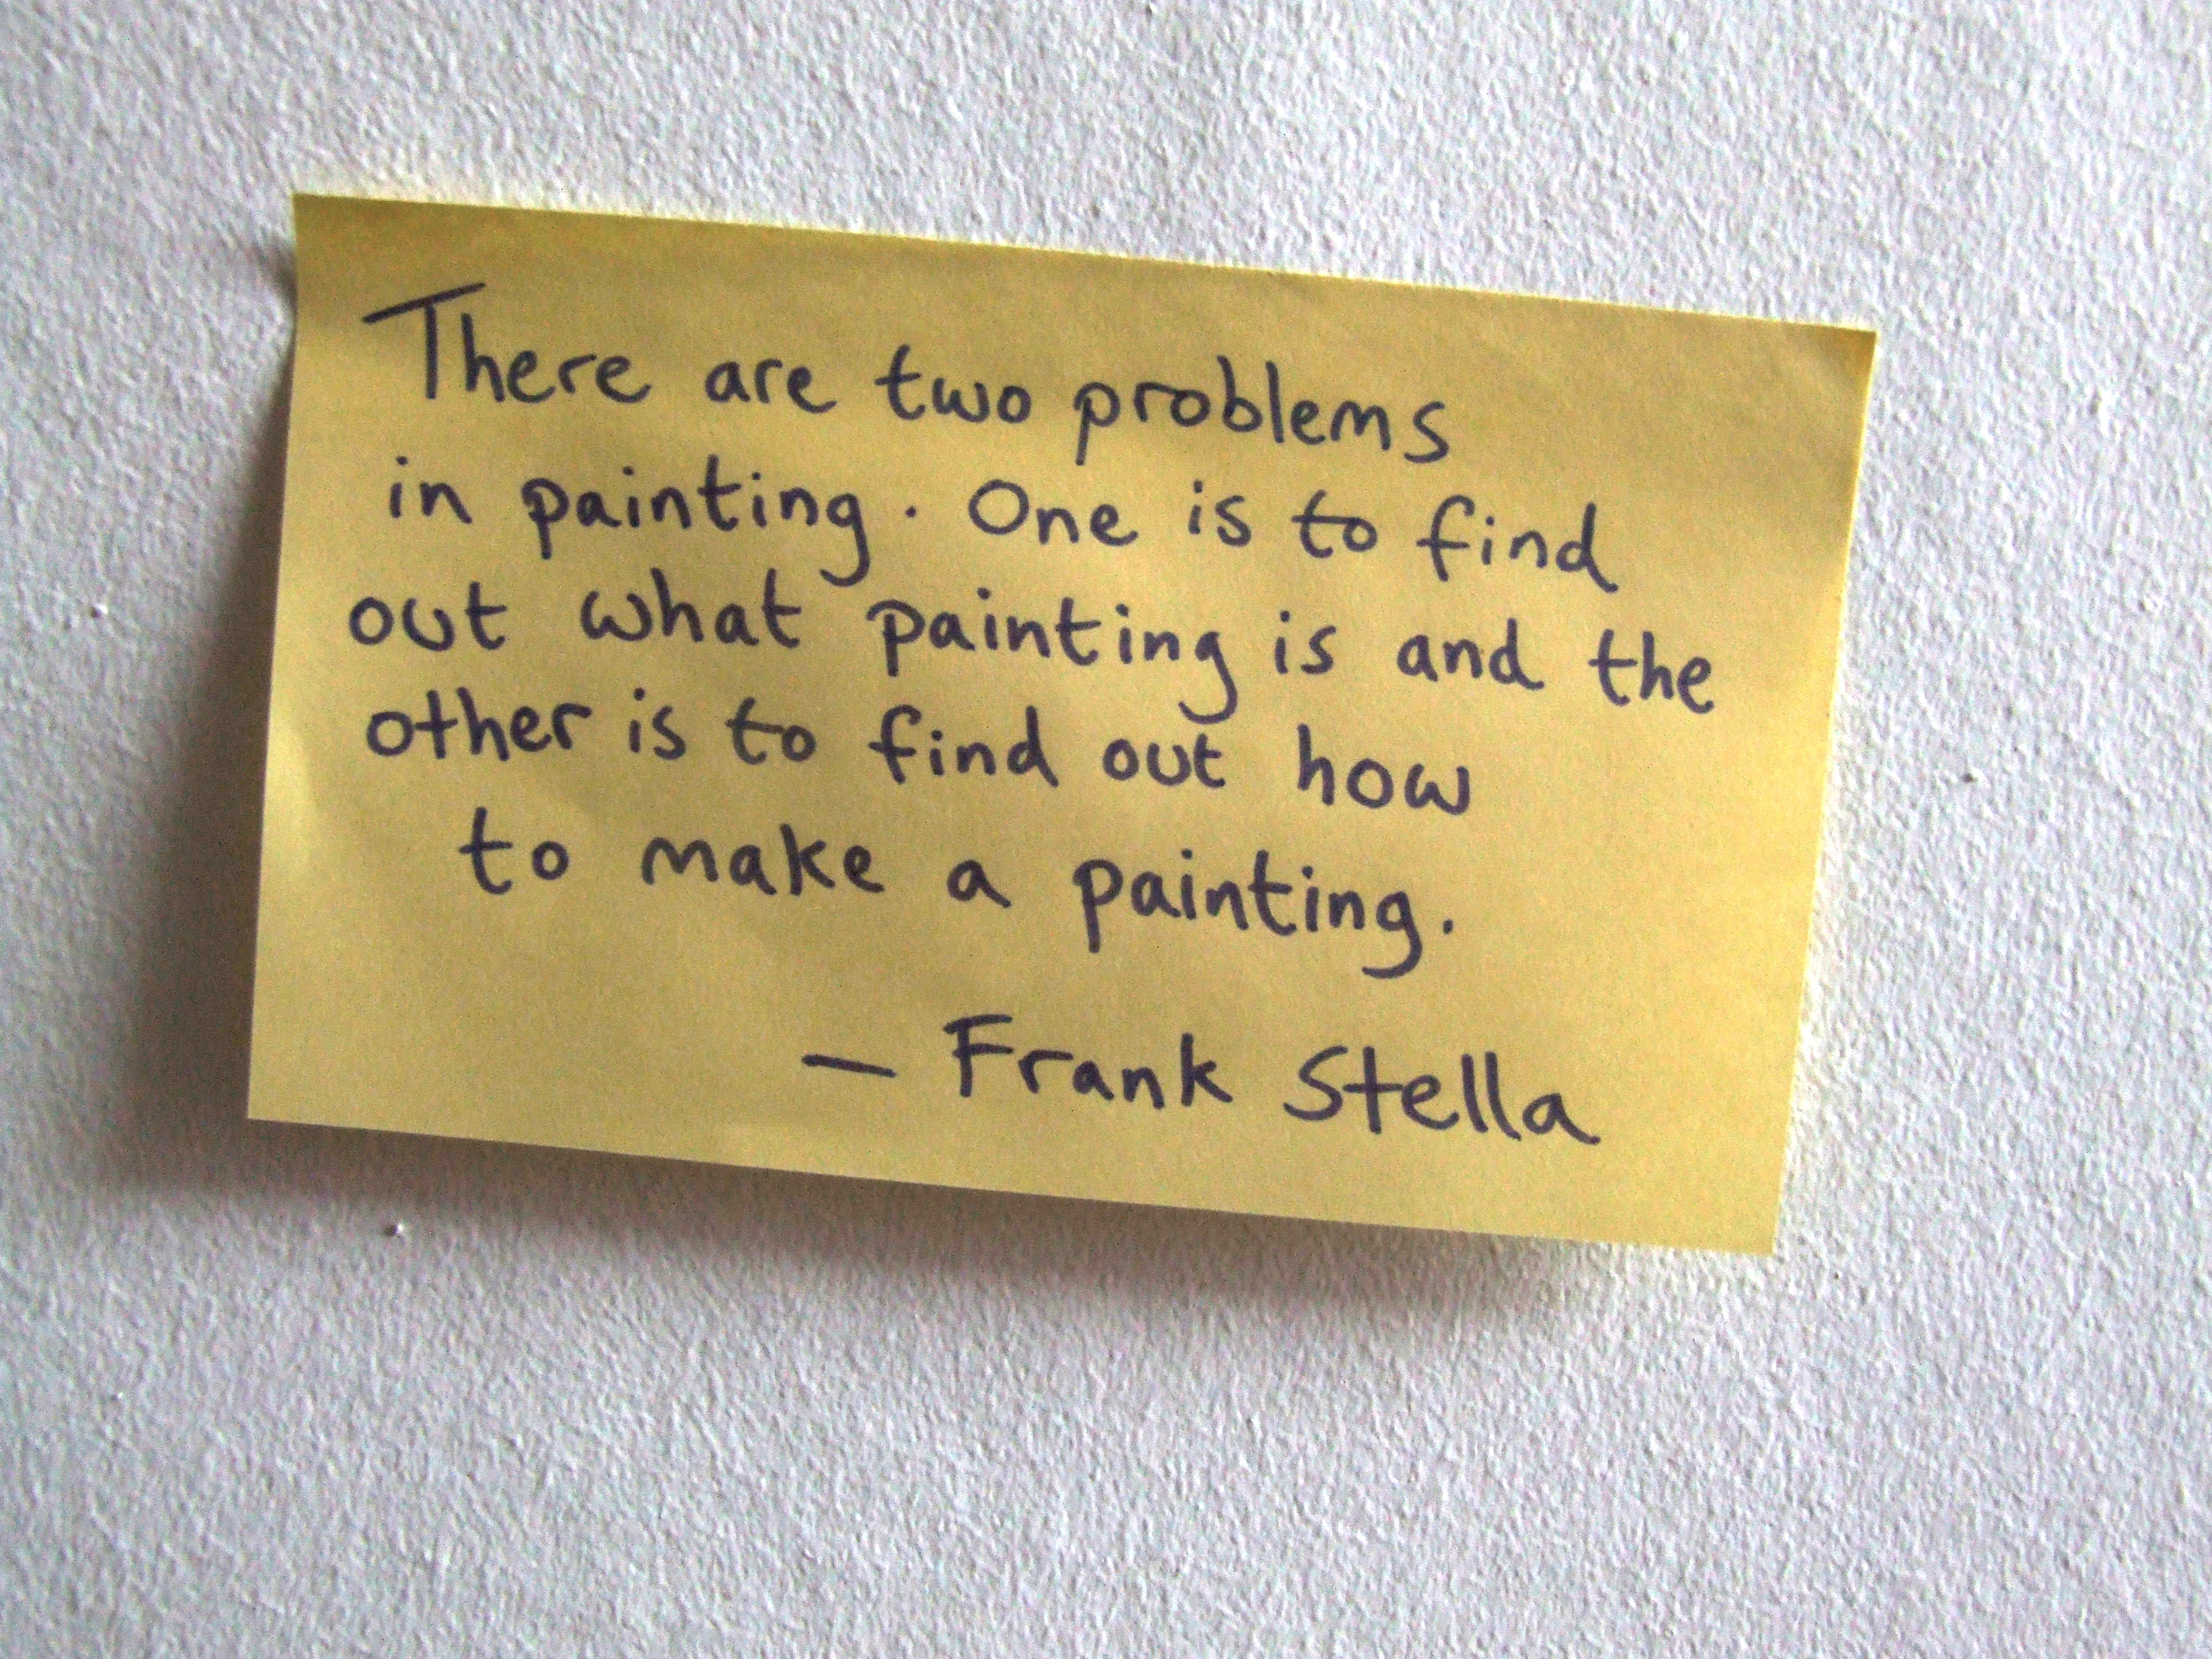 Frank Stella's quote